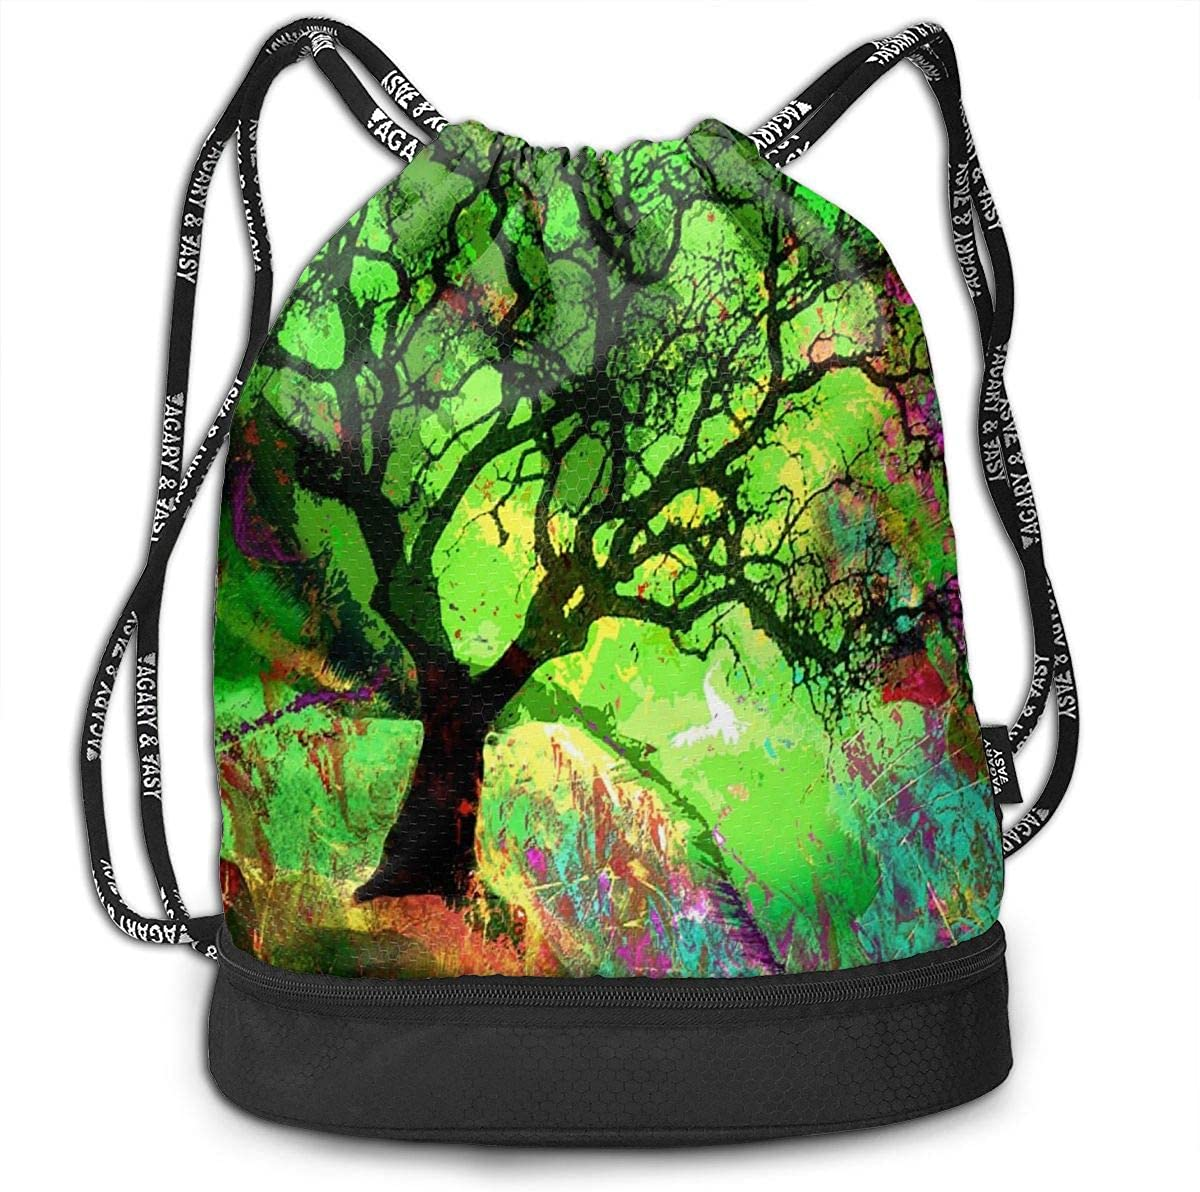 Fantasy Cool Wolves Art Drawstring Bag For Girls /& Boys Portable Bundle Backpack Gym Yoga Runner Sports Daypack